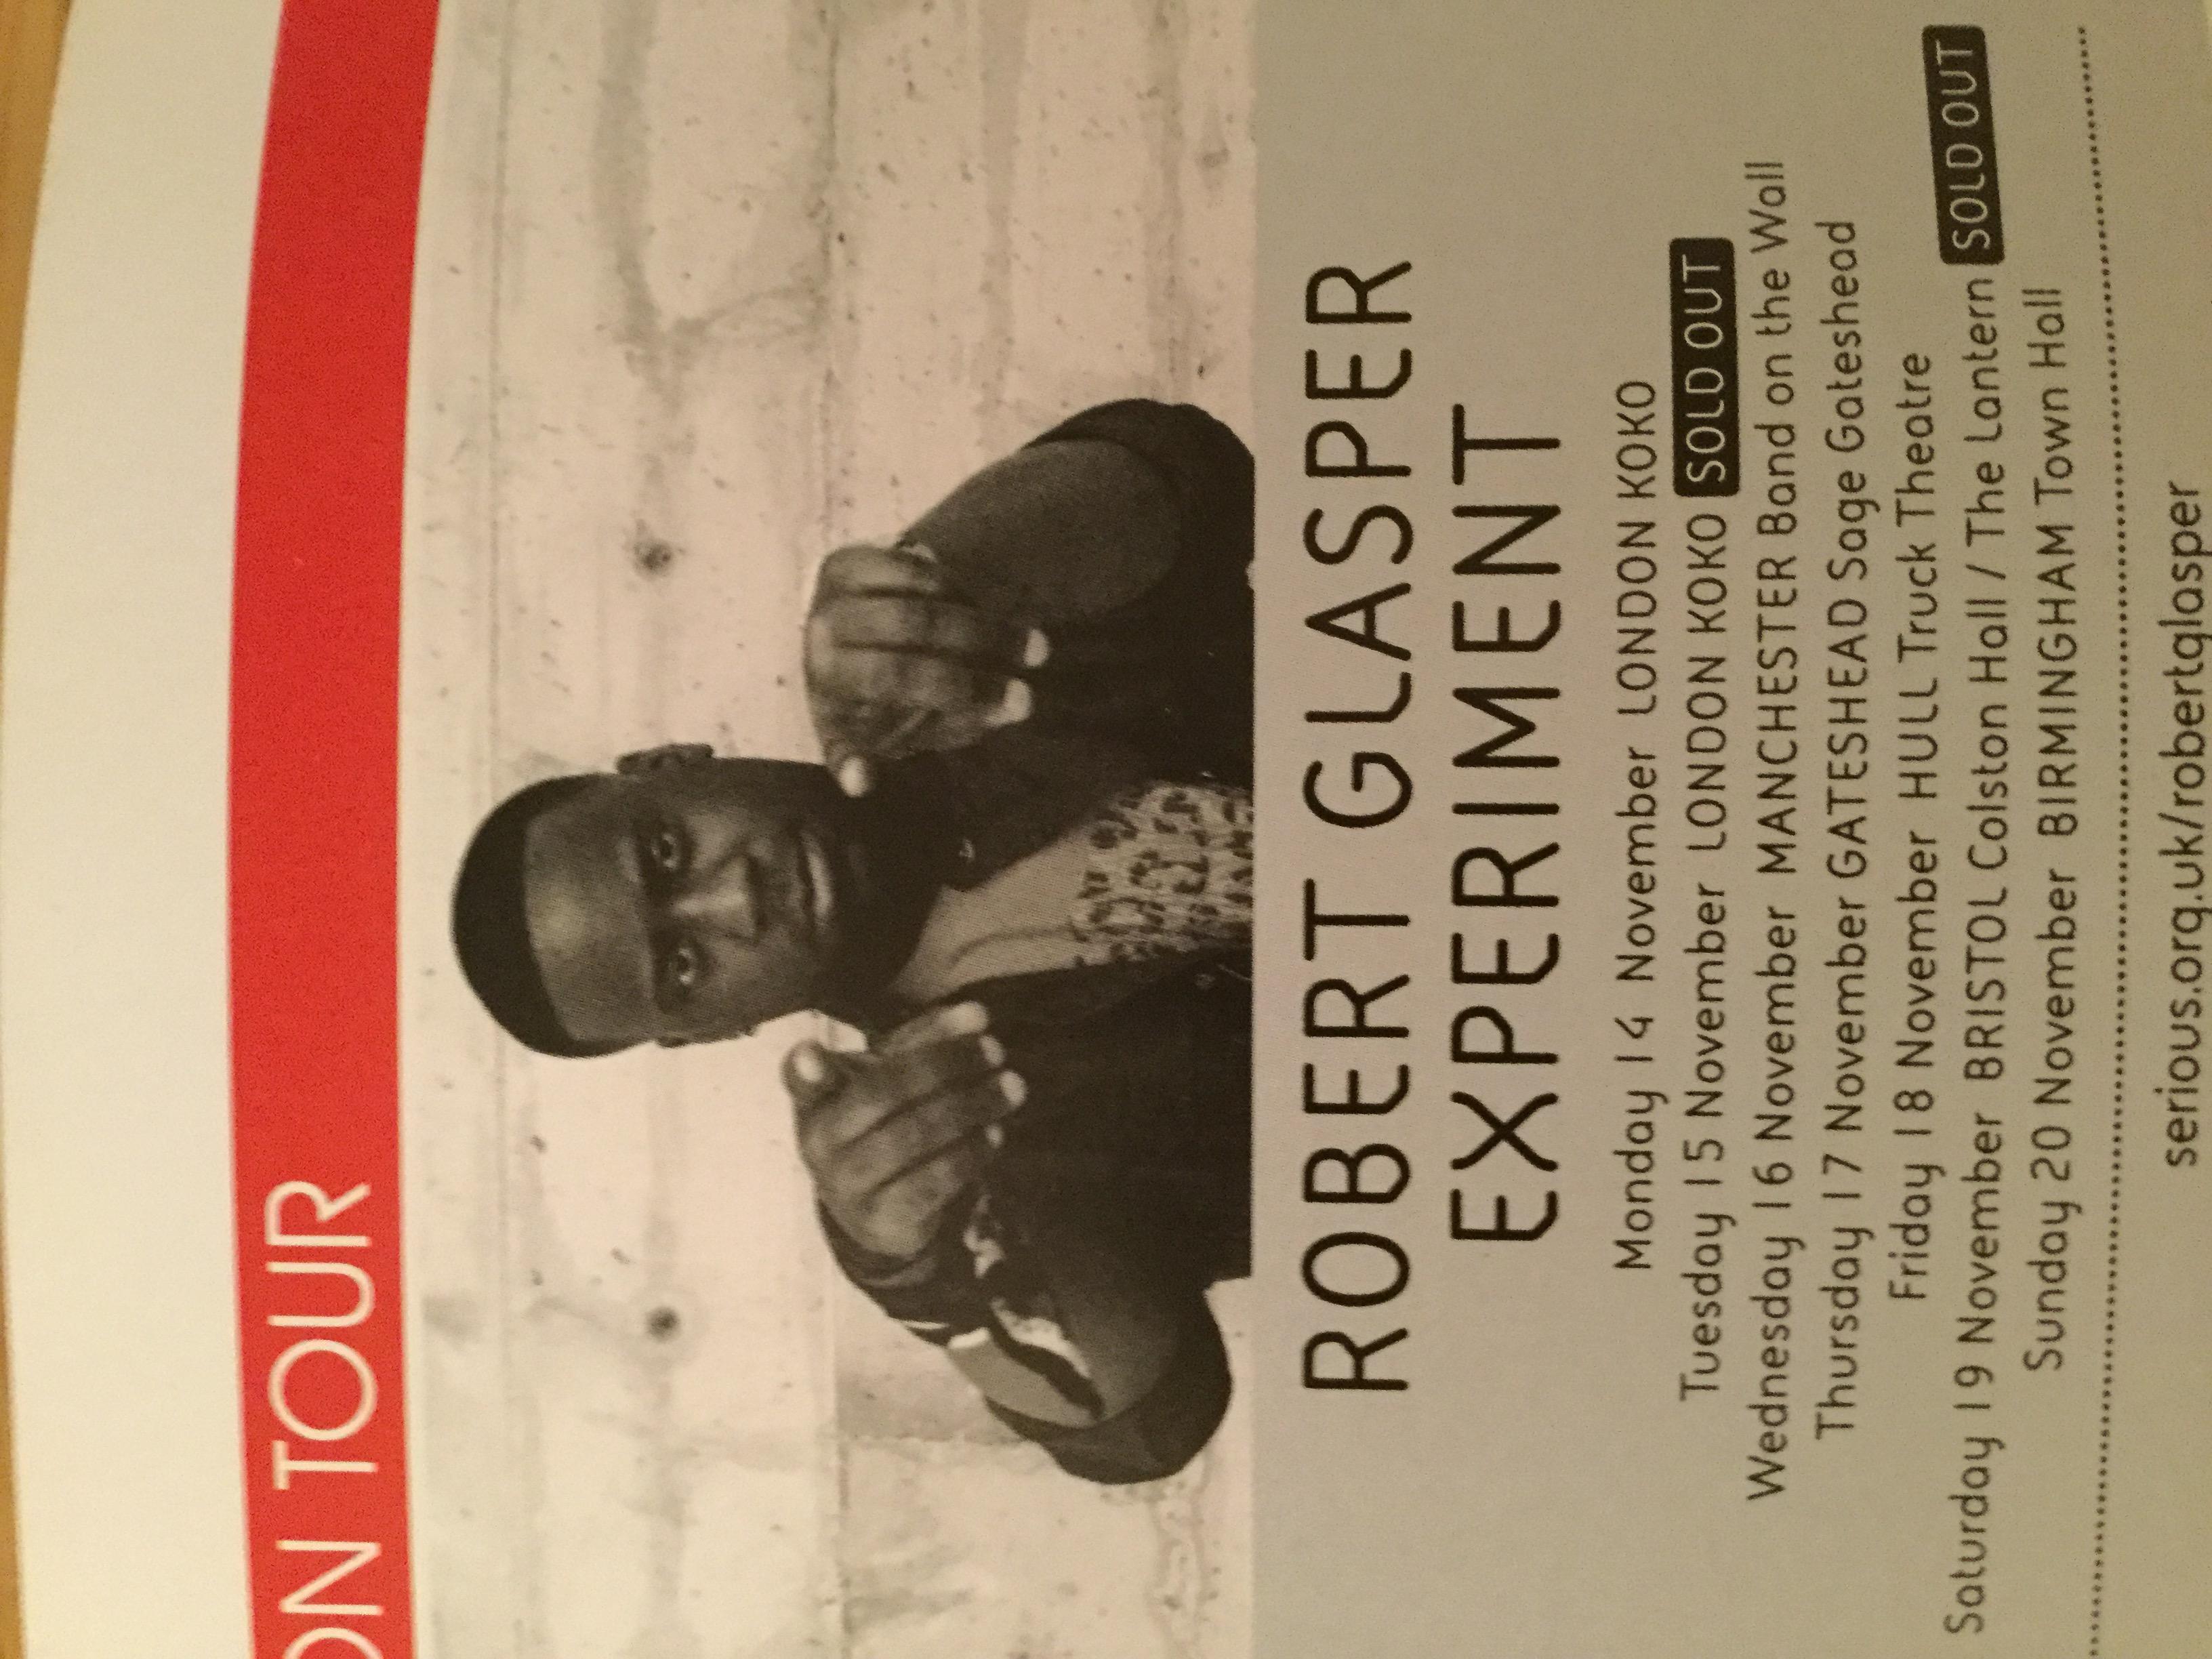 Live Review The Robert Glasper Experiment, Koko, EFG London Jazz Festival 14/11/16